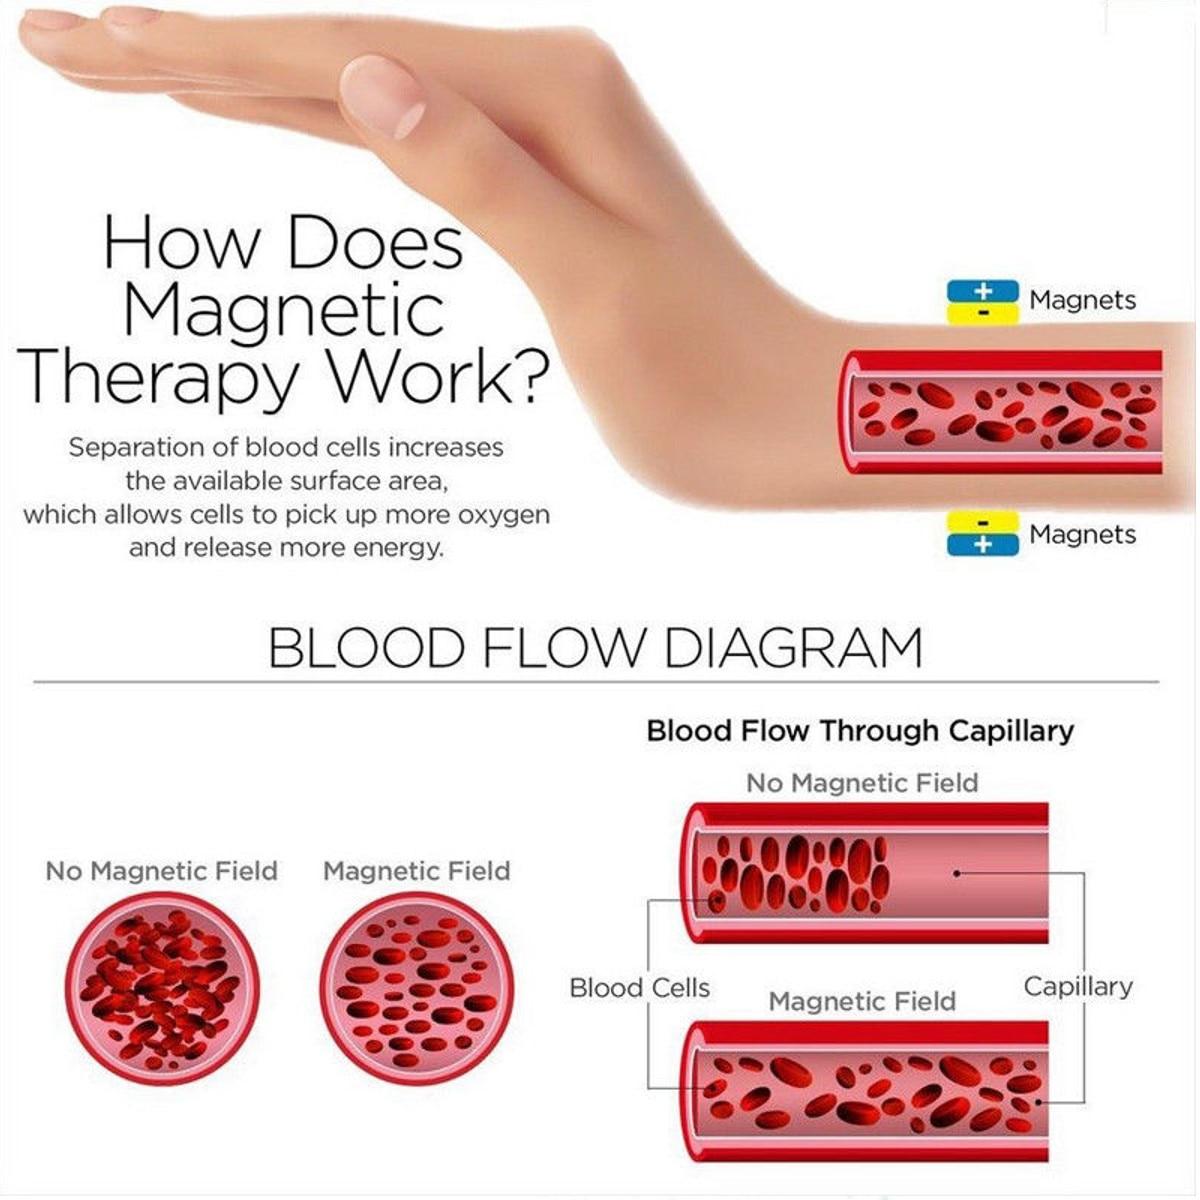 7 in 1 Titanium Magnetic Energy Armband Power Bio Bracelet Health Pain Relief Magnet Health Bracelet 2019 New